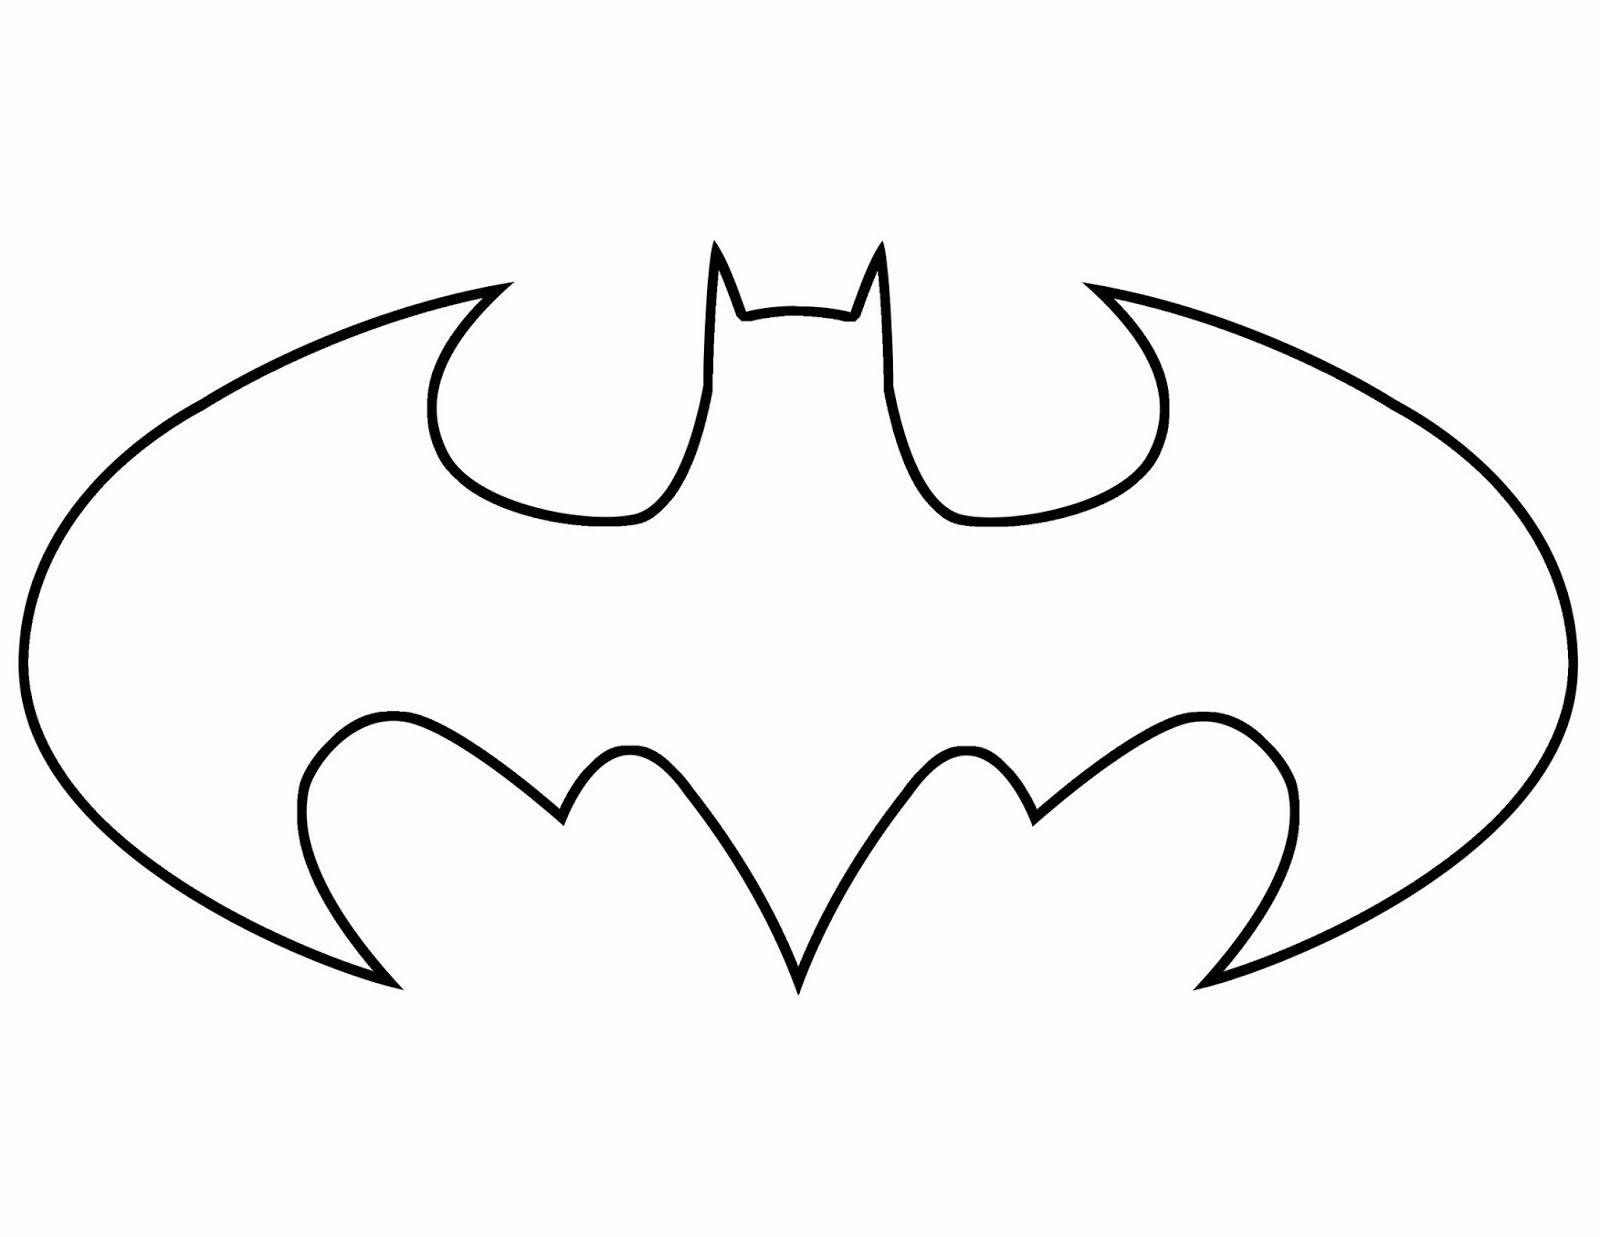 Spiderman Symbol Coloring Pages Images Batman Para Colorear